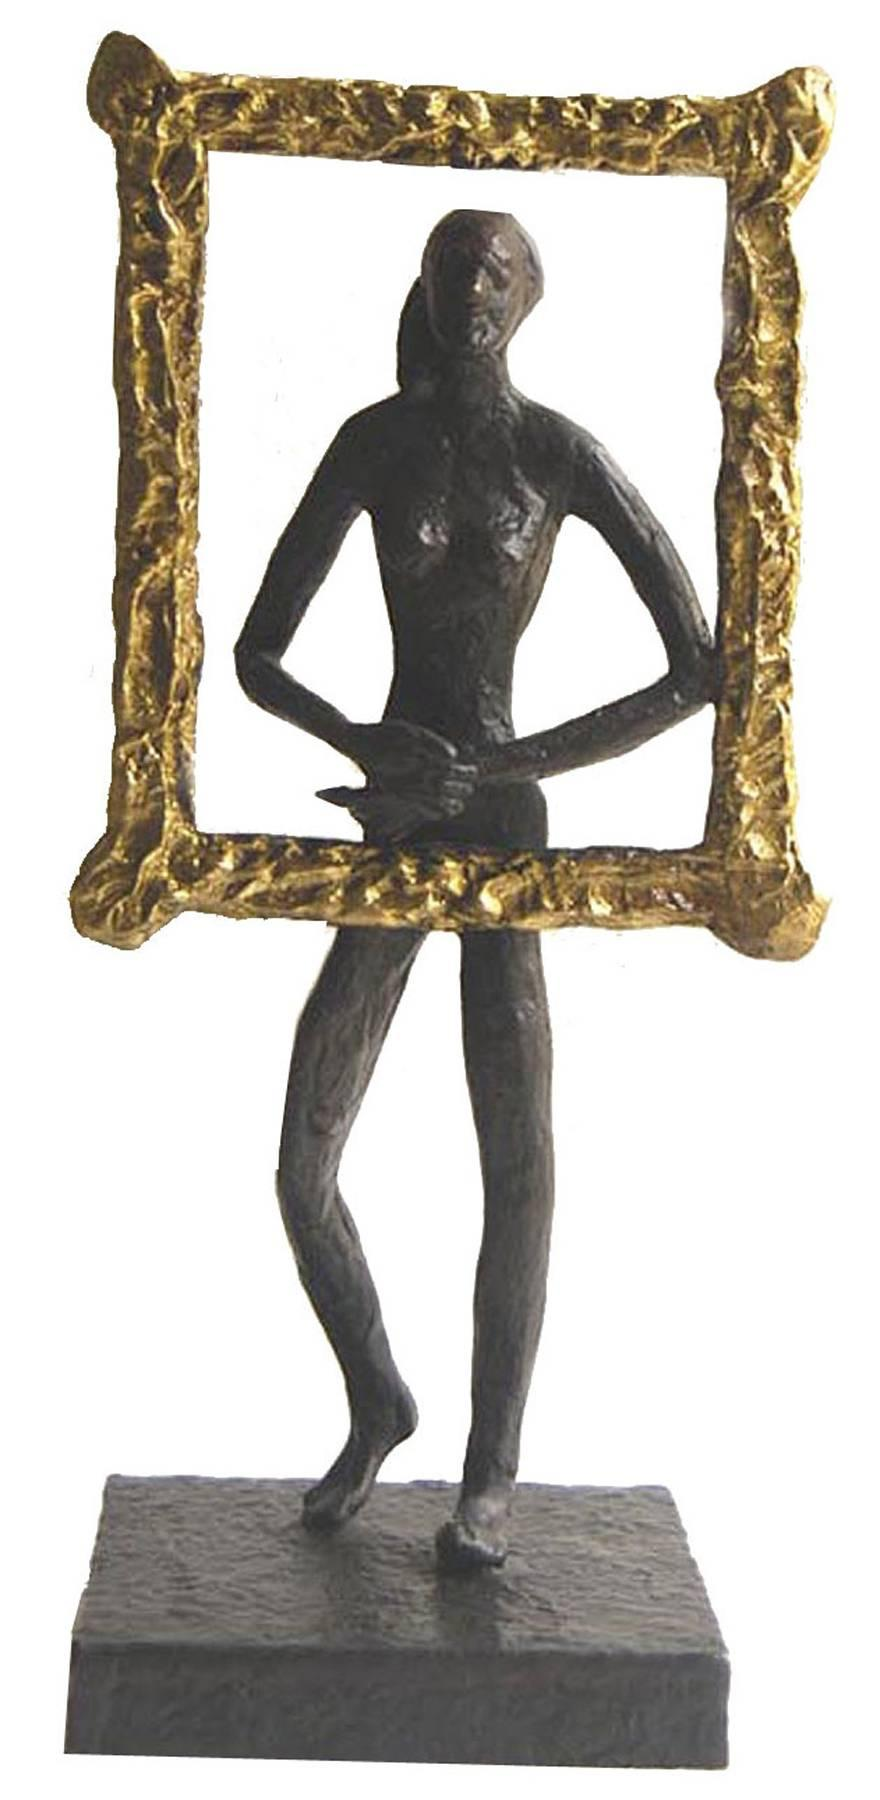 "Maiya as Monalisa, Golden Metallic frames with smile,Bronze Sculpture""In Stock"""